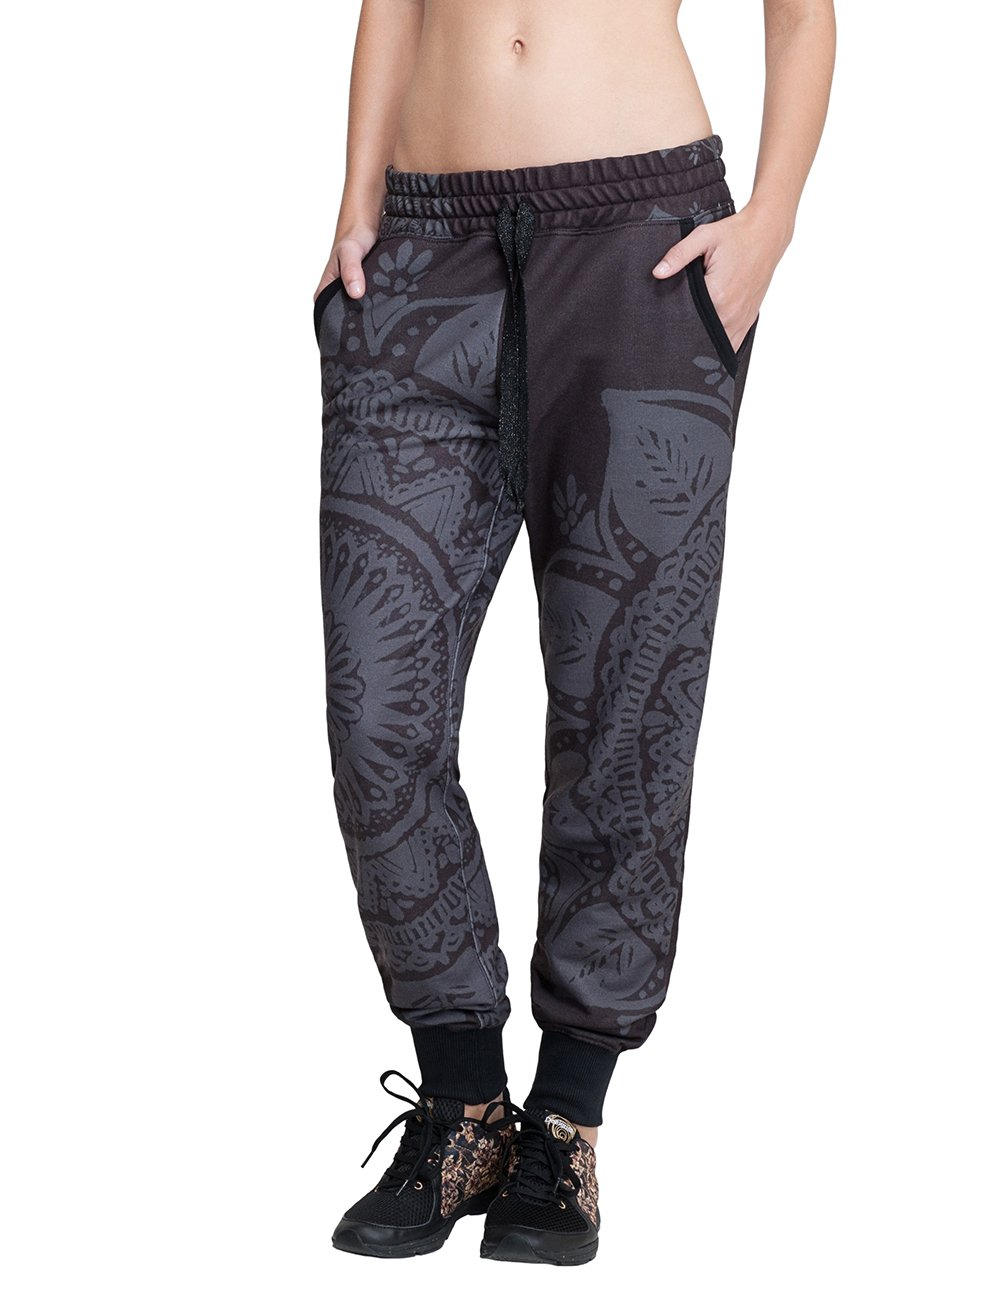 Desigual Donna Pantaloni L Woven Long Track Suit Pants, Grigio, XS, 67P2SB1 DESBK|#Desigual